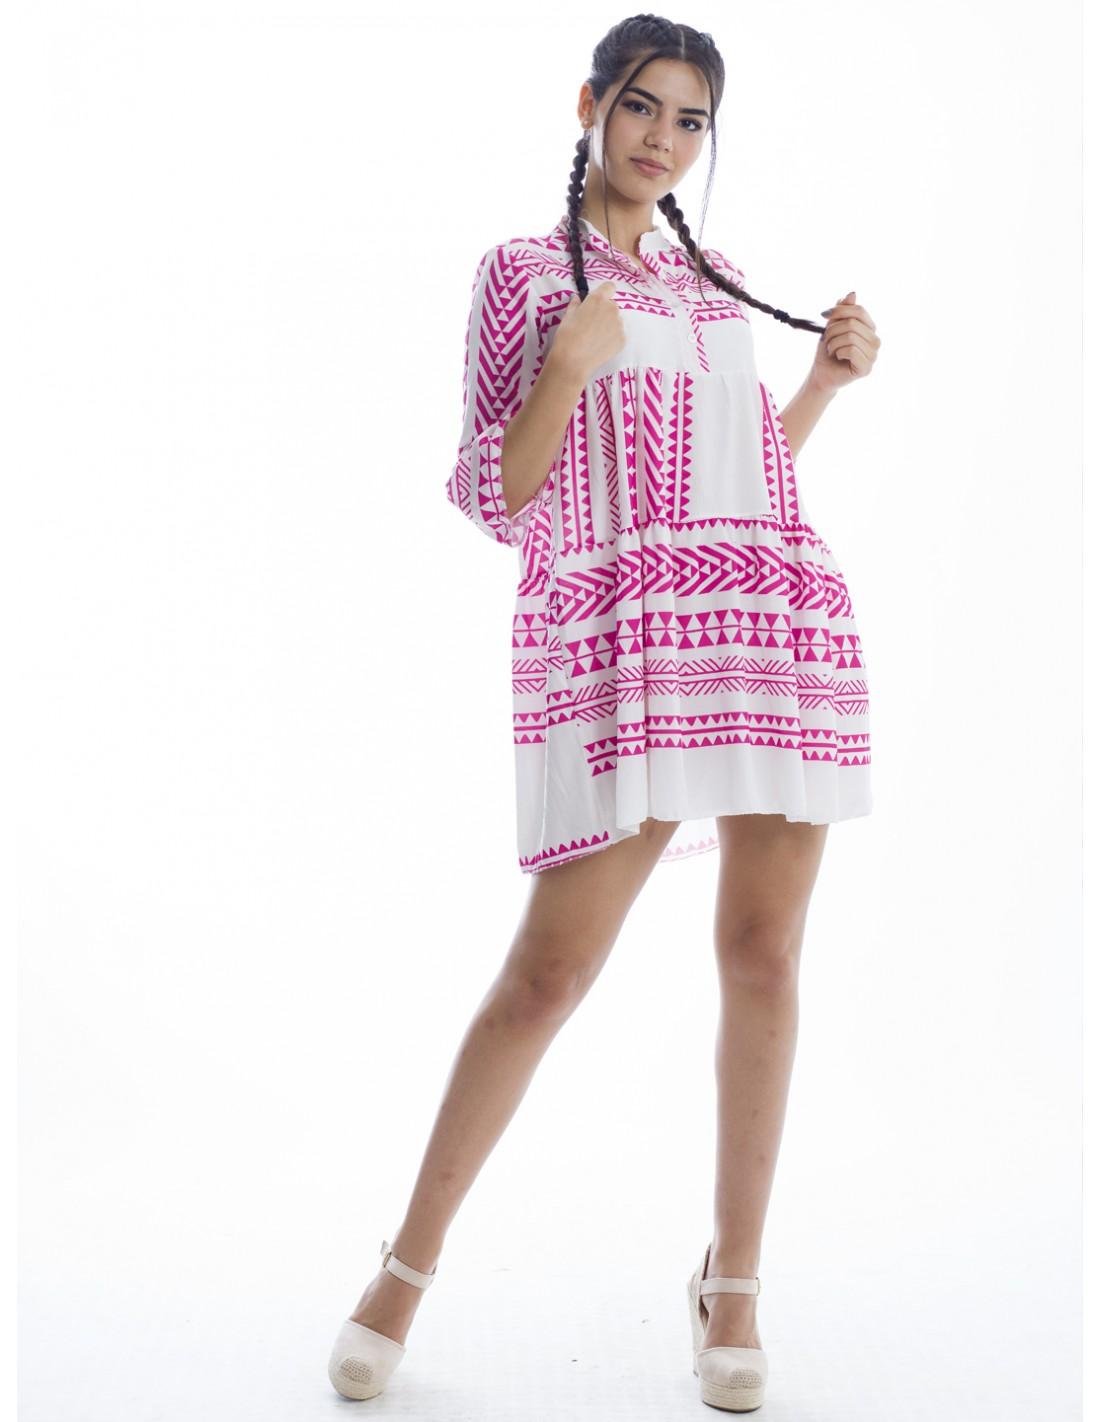 Robe Courte Fashion Vetements Zerda Boutique Mode Pas Cher